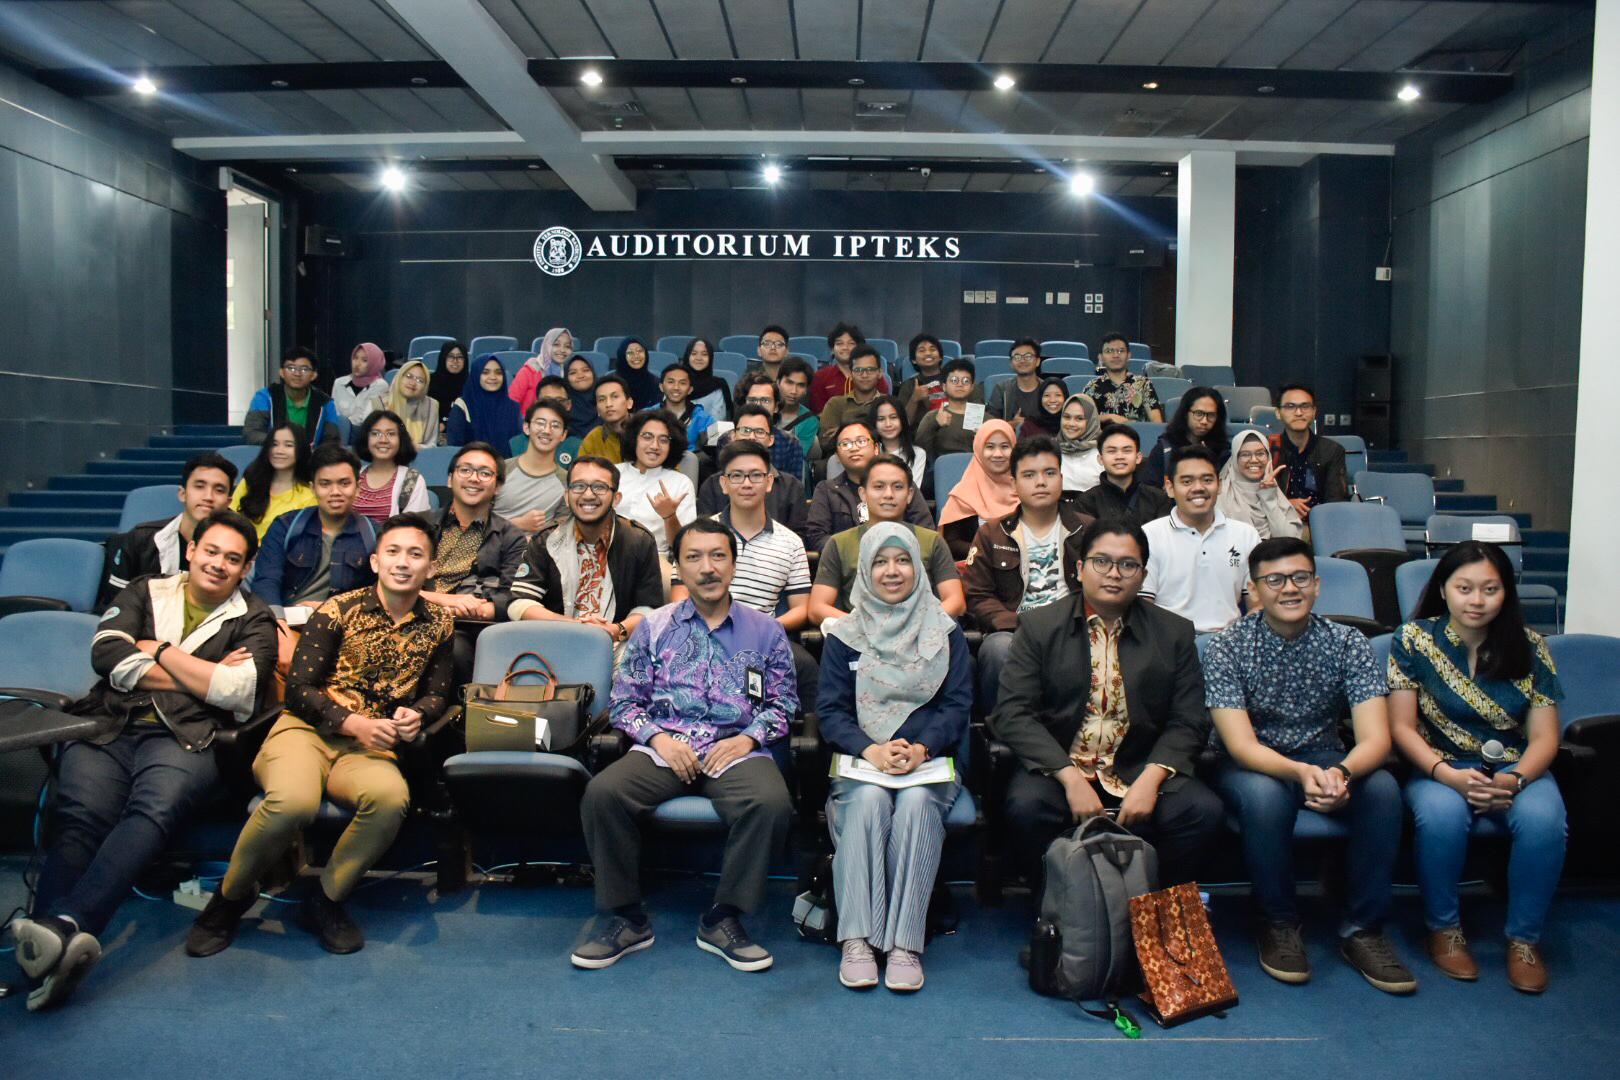 Foto bersama para narsum dan peserta seminar Society of Renewable Energy di Kampus ITB, Bandung. (07/03/2020)